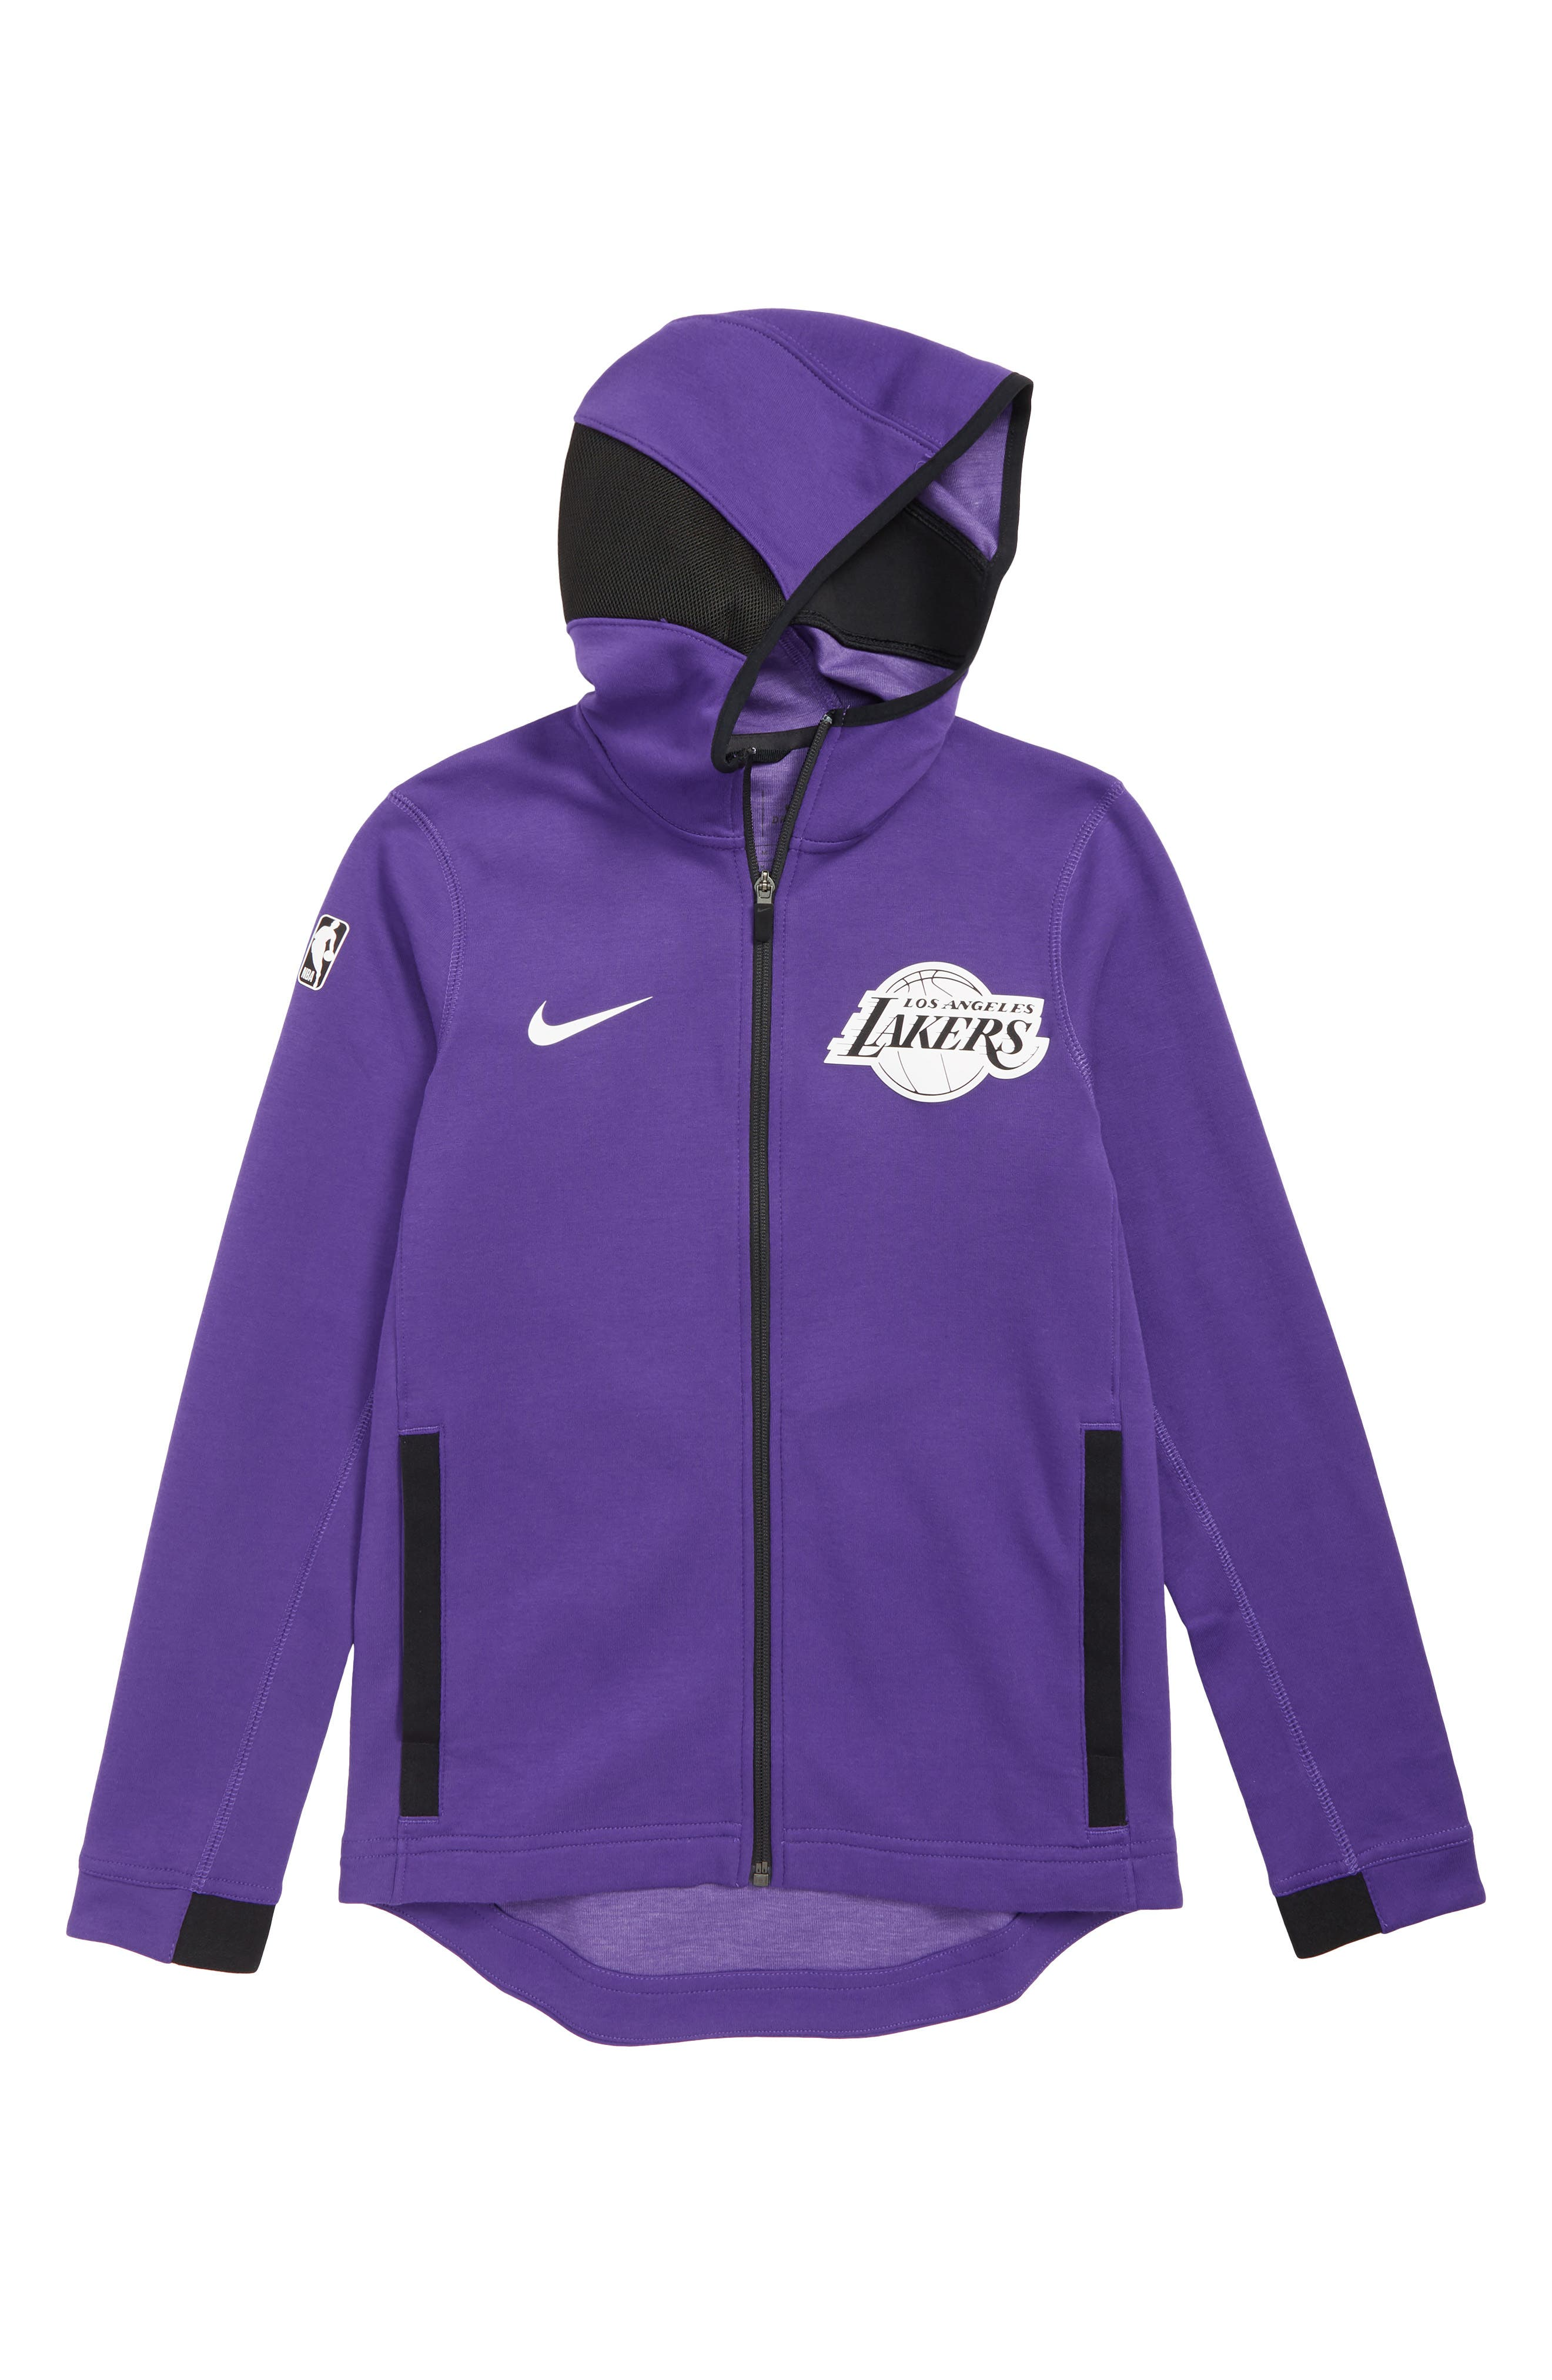 Boys Nike Los Angeles Lakers Showtime DriFit Hoodie Size L (1416)  Purple